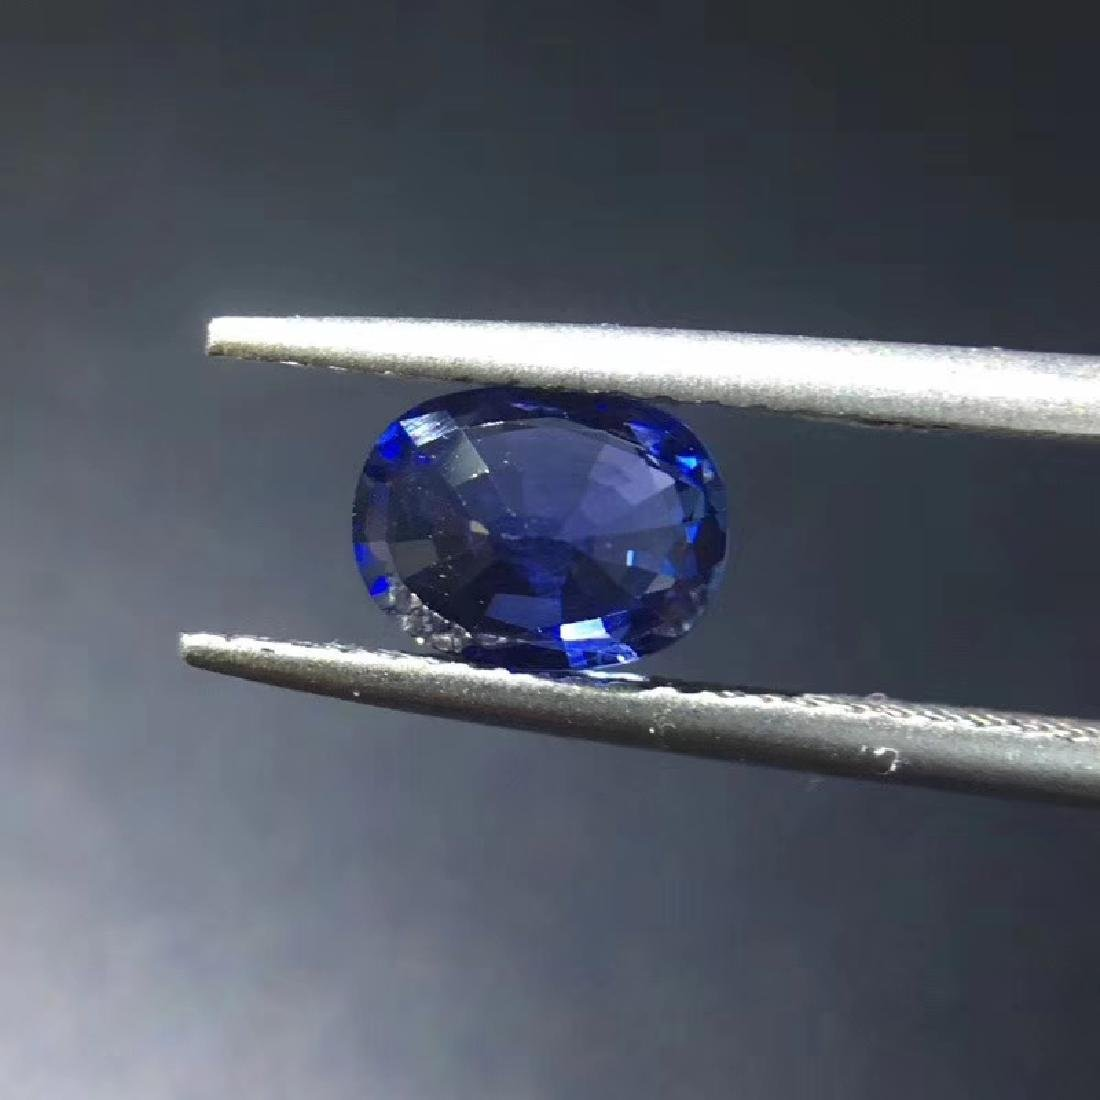 1.07 ct Sapphire 5.3*7.0*3.0 mm Oval Cut - 5